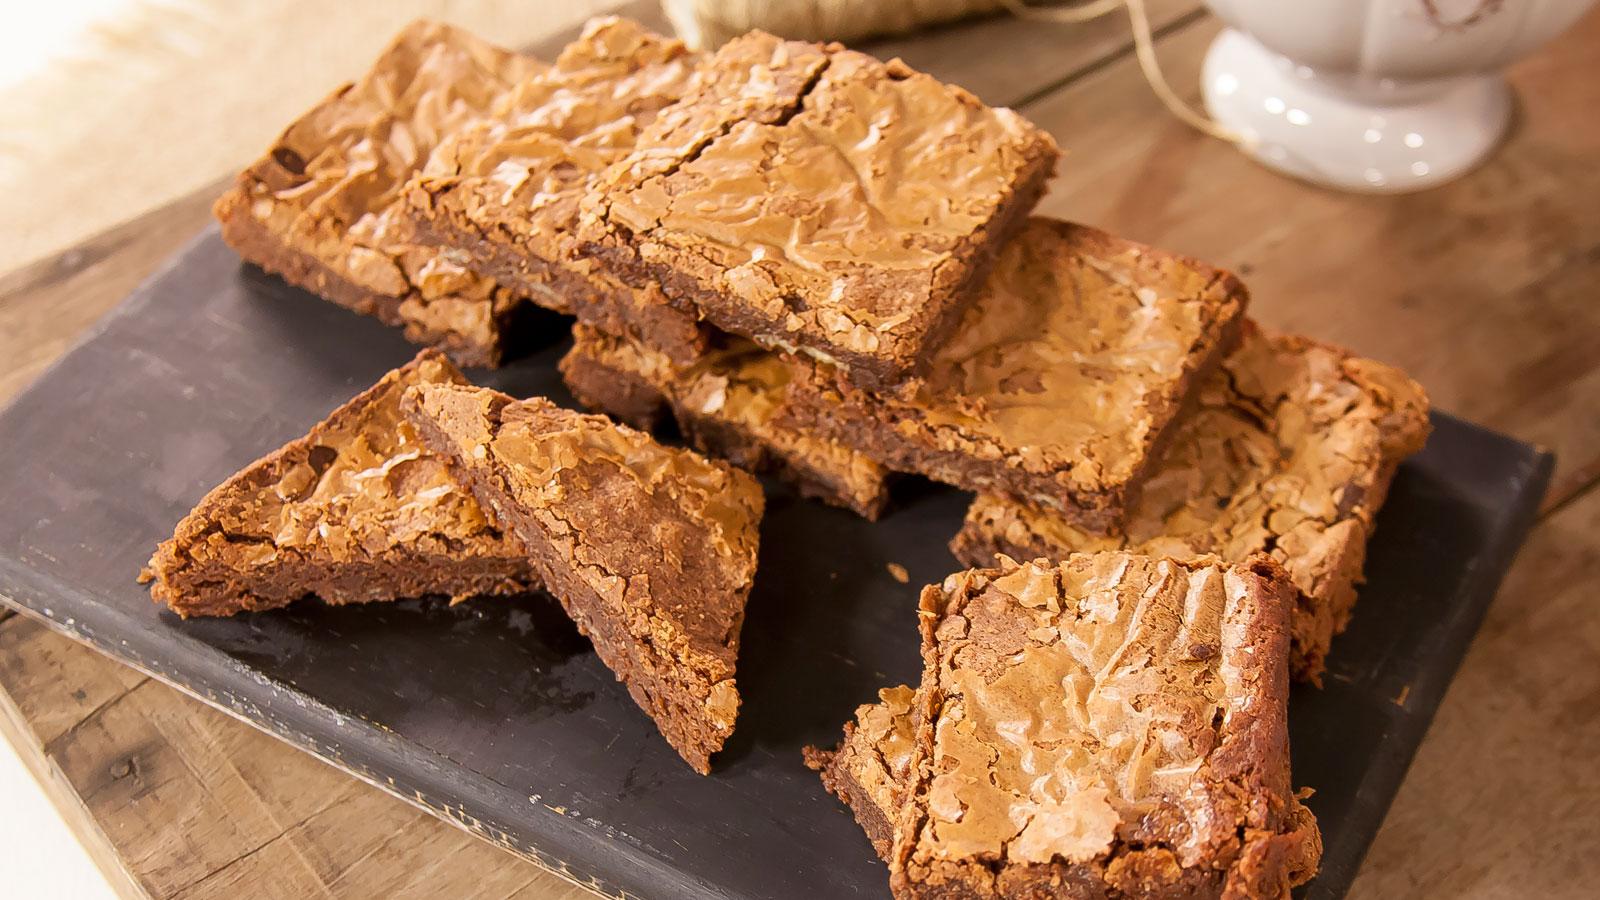 brownie de leche condensada virginia sar receta